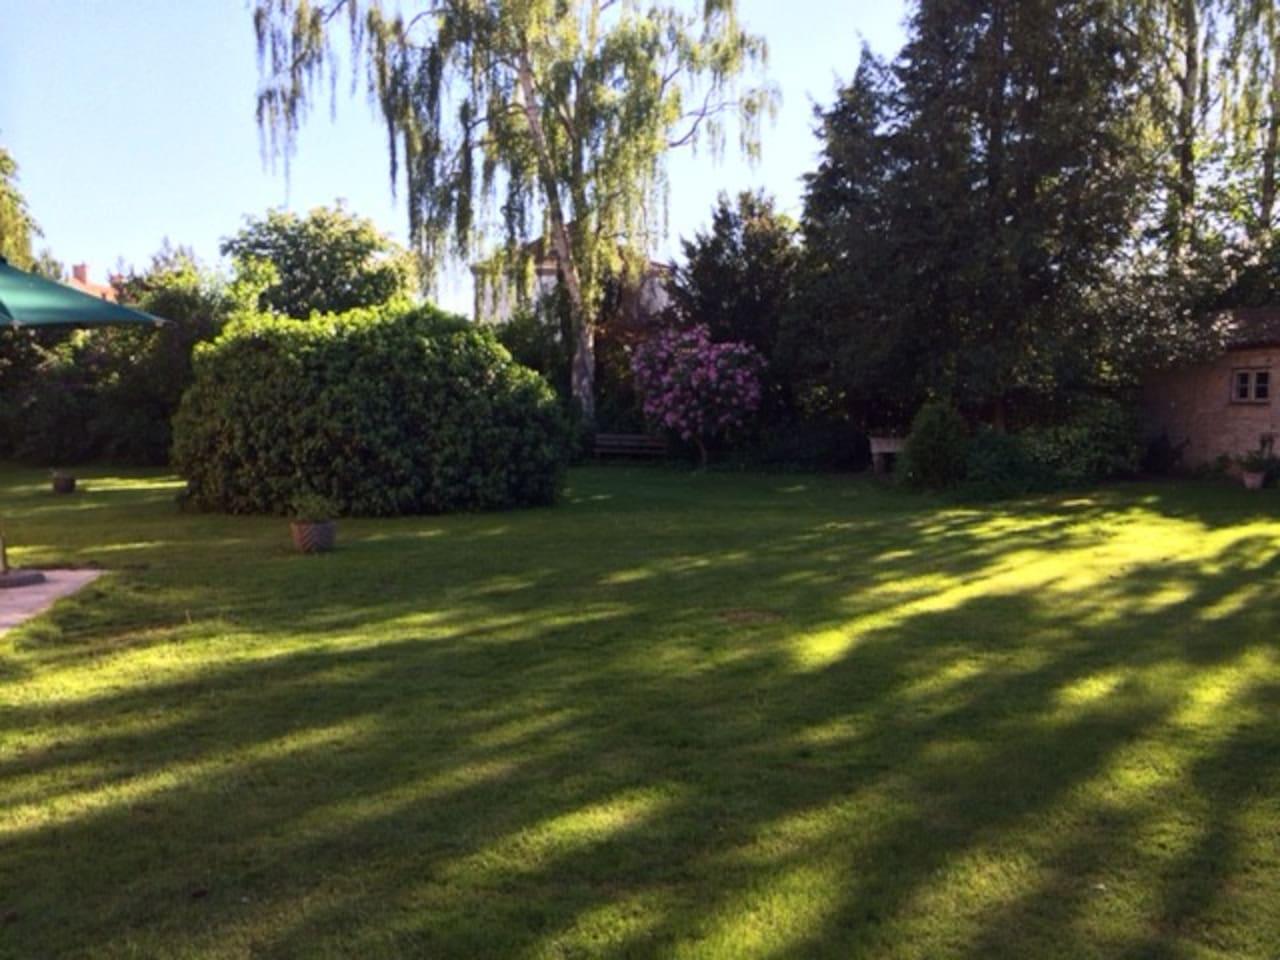 … and more garden